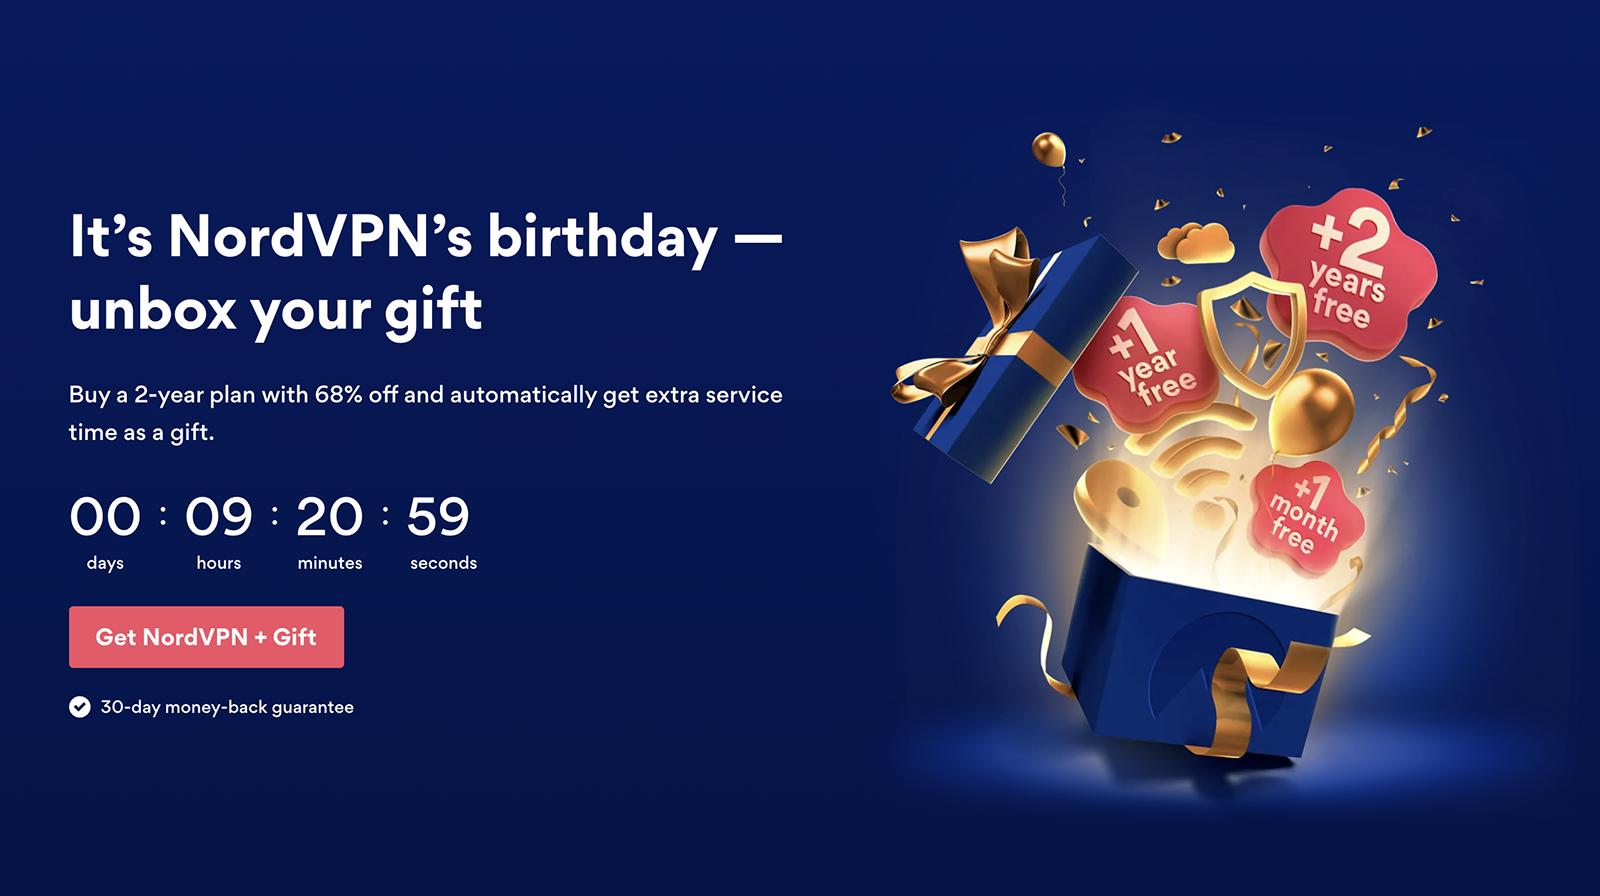 NordVPN birthday discount